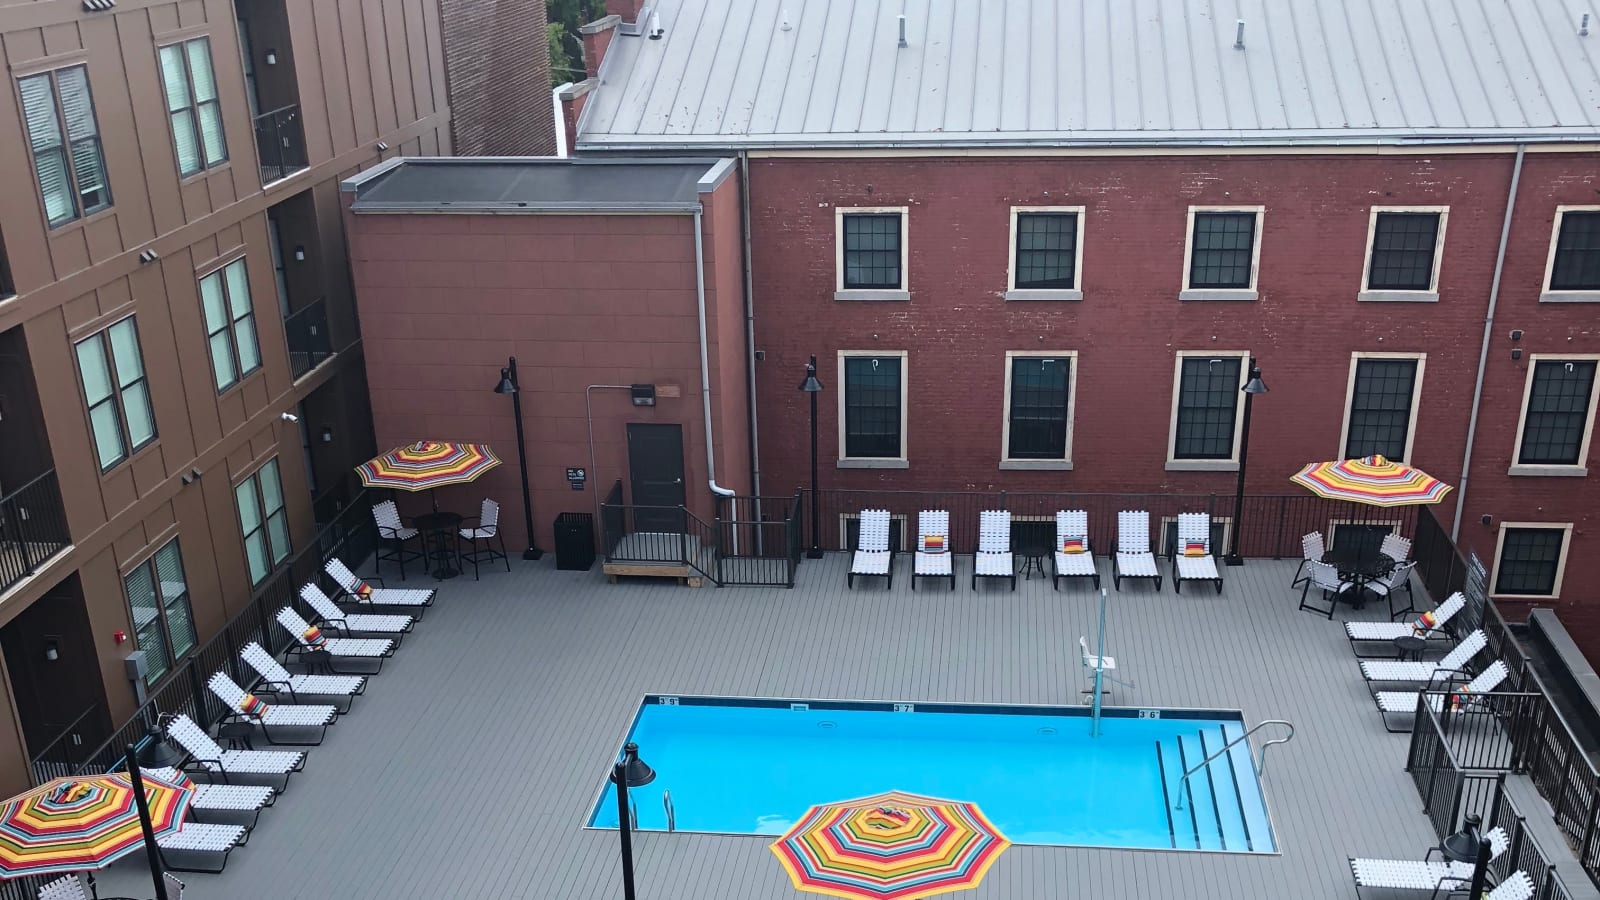 The Edge offers a beautiful swimming pool in Richmond, Virginia